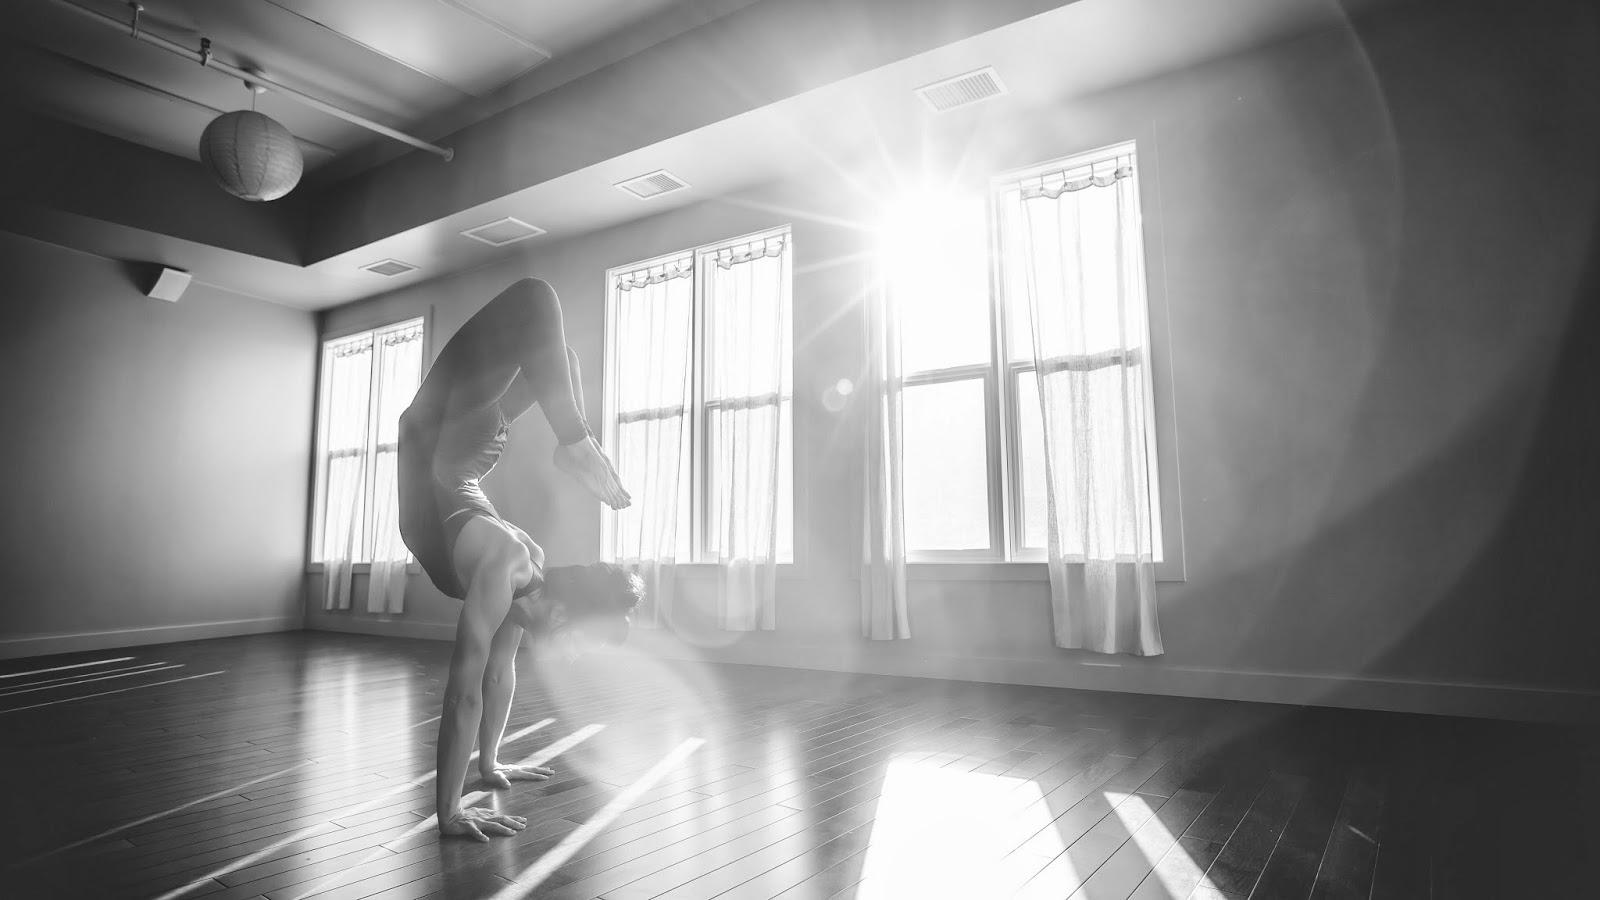 Edmonton Yoga, I am a Prairie Yogi, Prairie Yoga, Benefits of Yoga, Moksha Yoga Edmonton, Teresa Byer, Jenn Crebas, Jenn Crebas Photography,